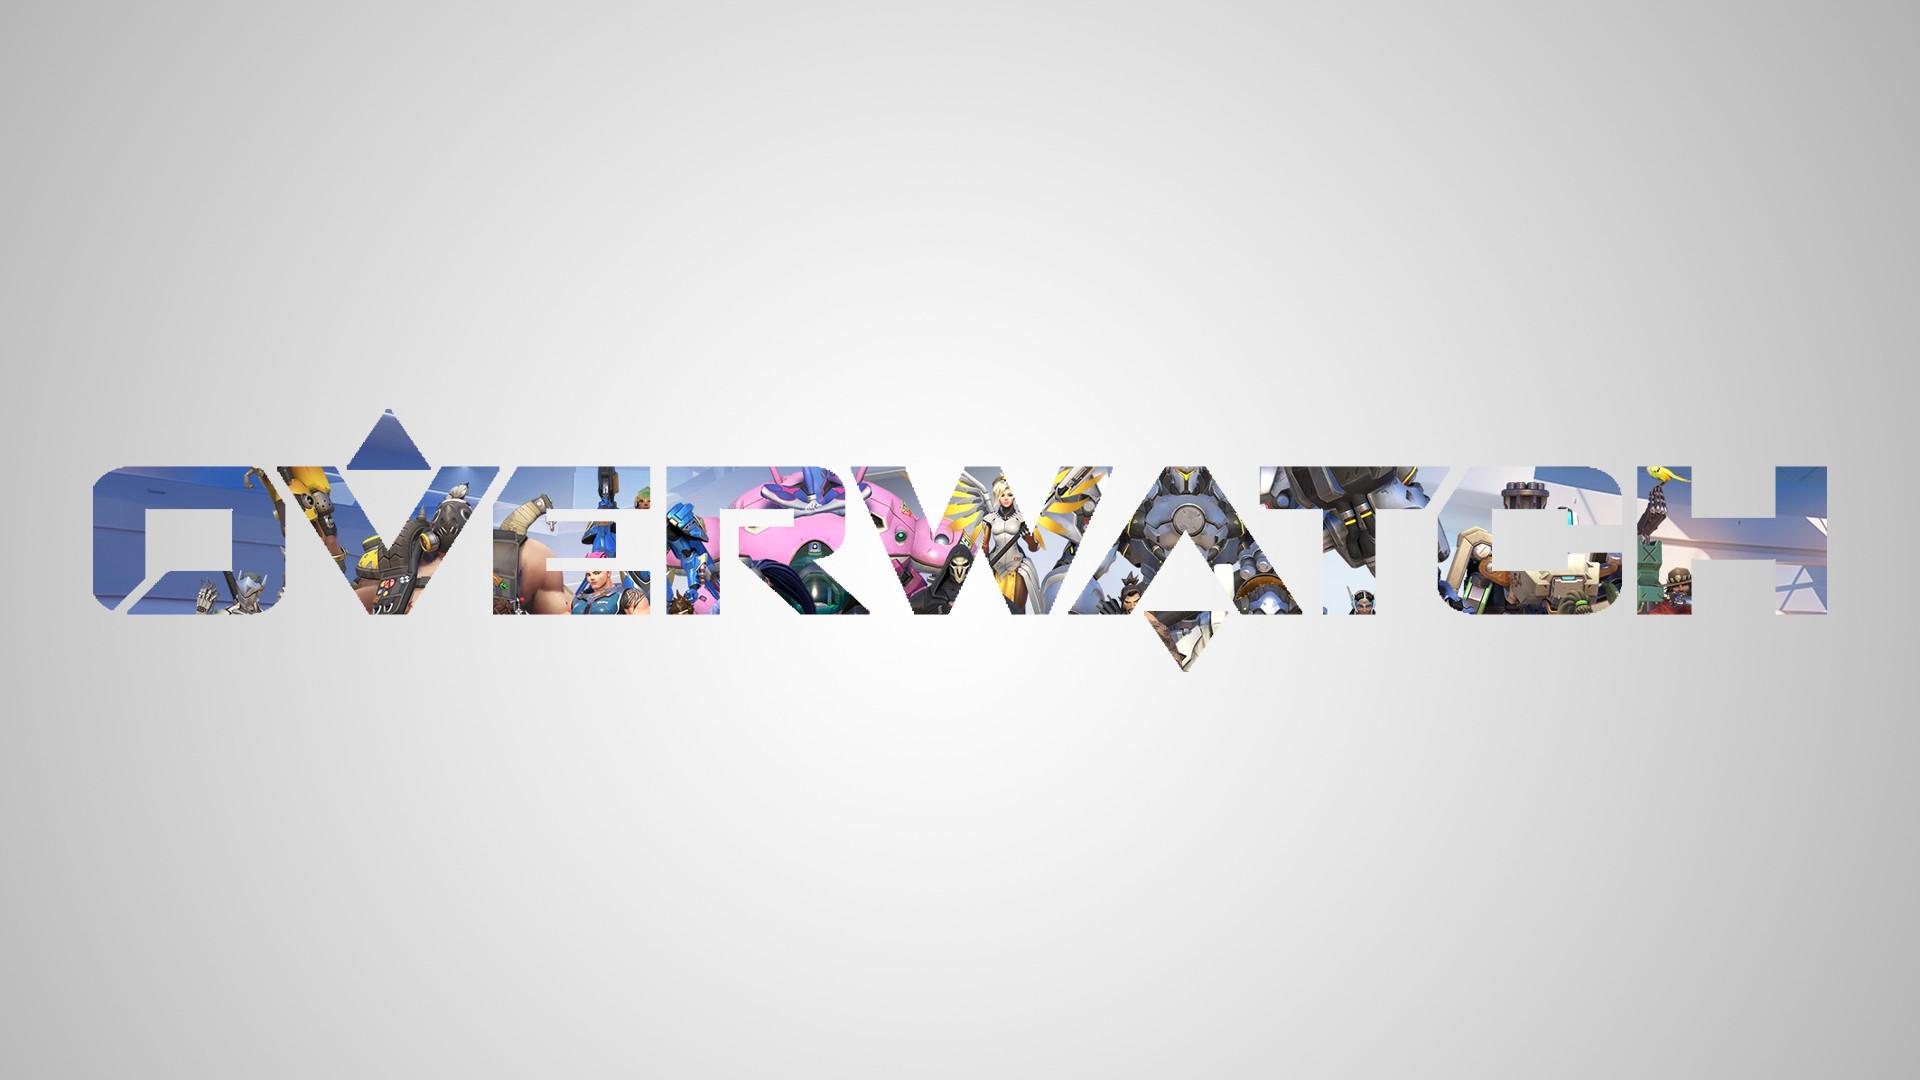 Overwatch Wallpaper 1920x1080 (86+ immagini)